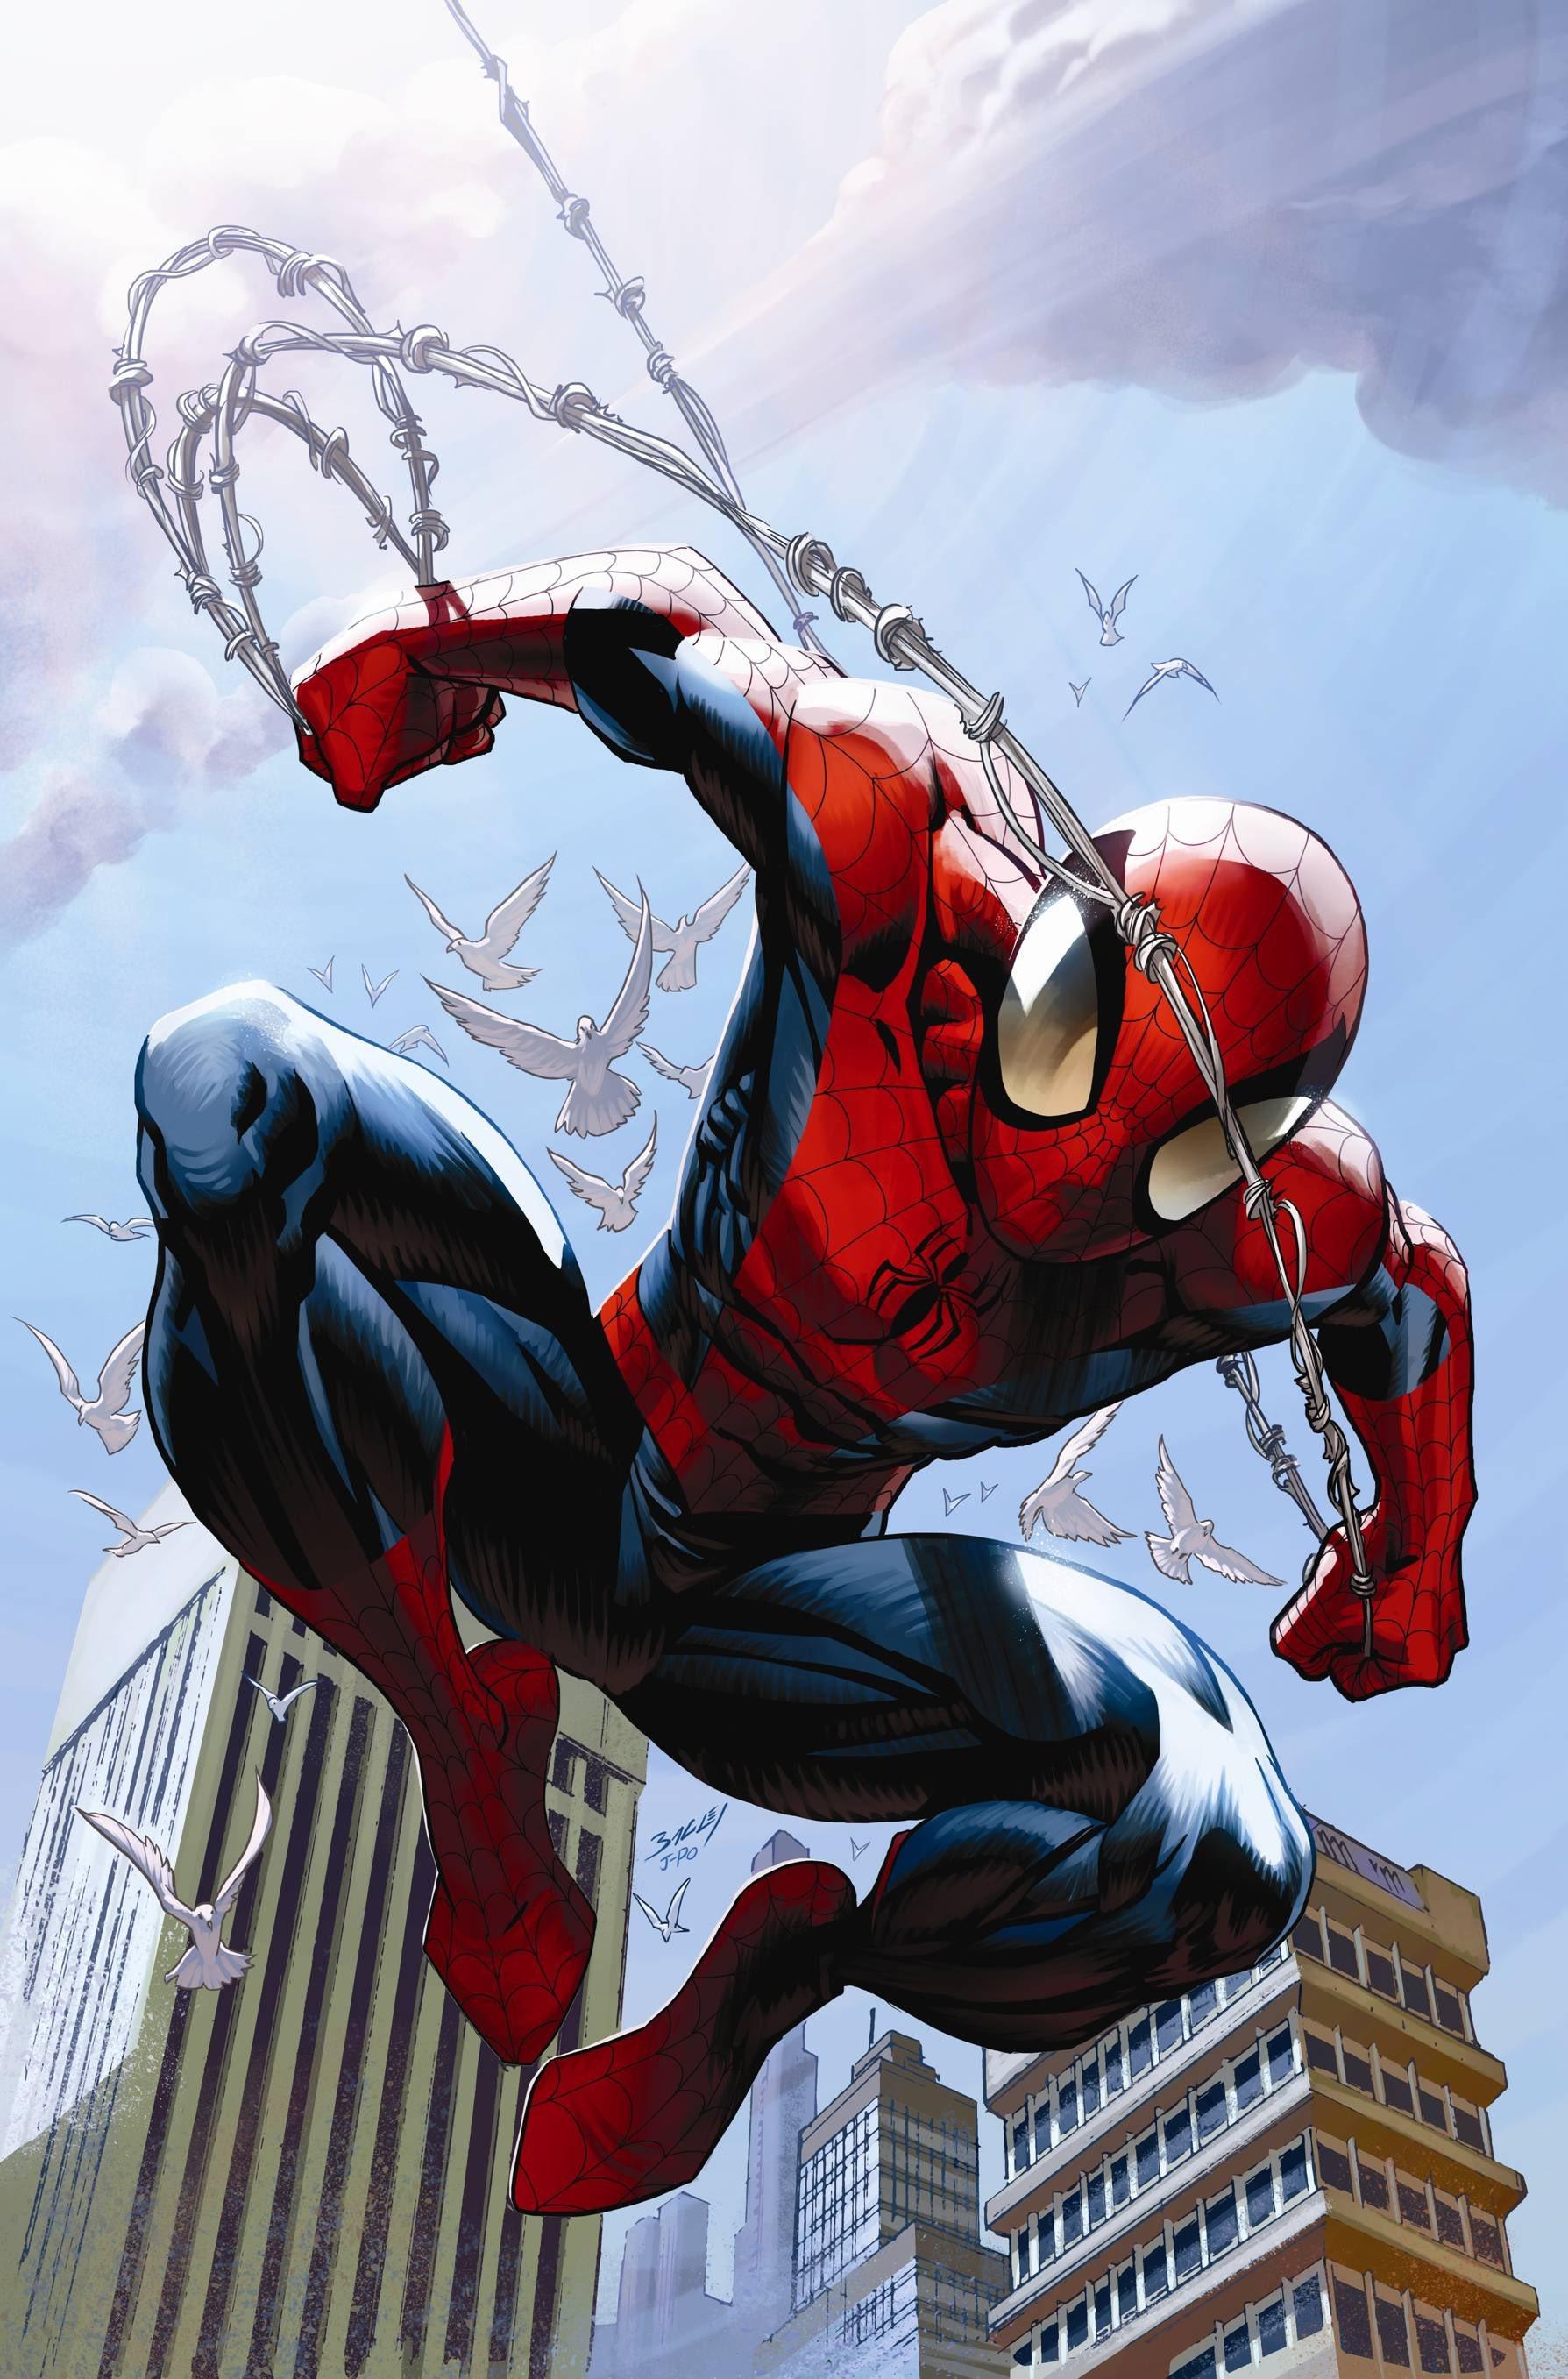 http://img3.wikia.nocookie.net/__cb20110310161834/marveldatabase/images/8/87/Ultimate_Spider-Man_Vol_1_156_Textless.jpg